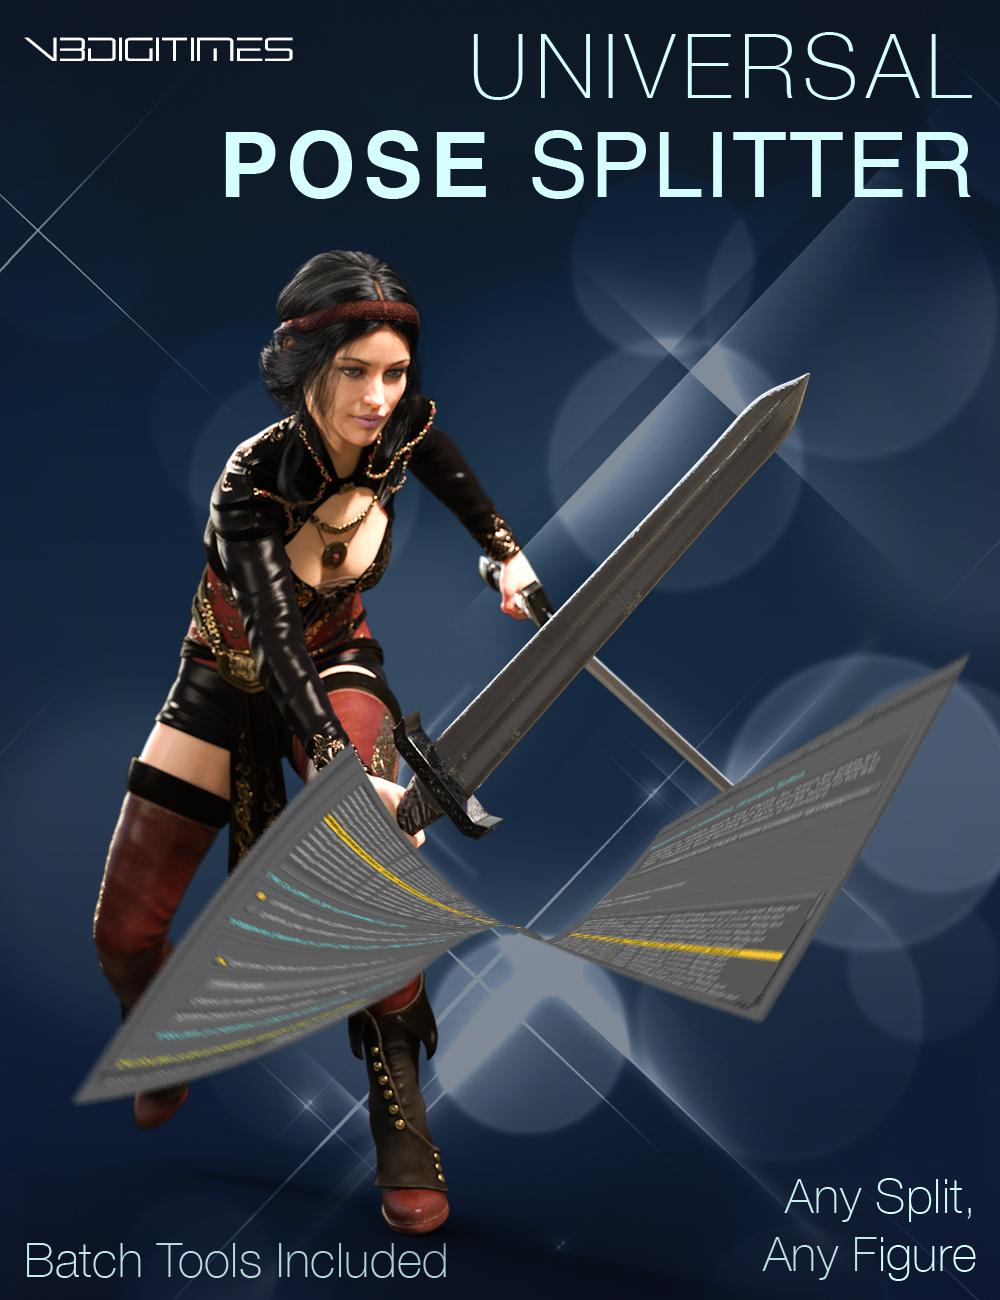 Universal Pose Splitter by: V3Digitimes, 3D Models by Daz 3D